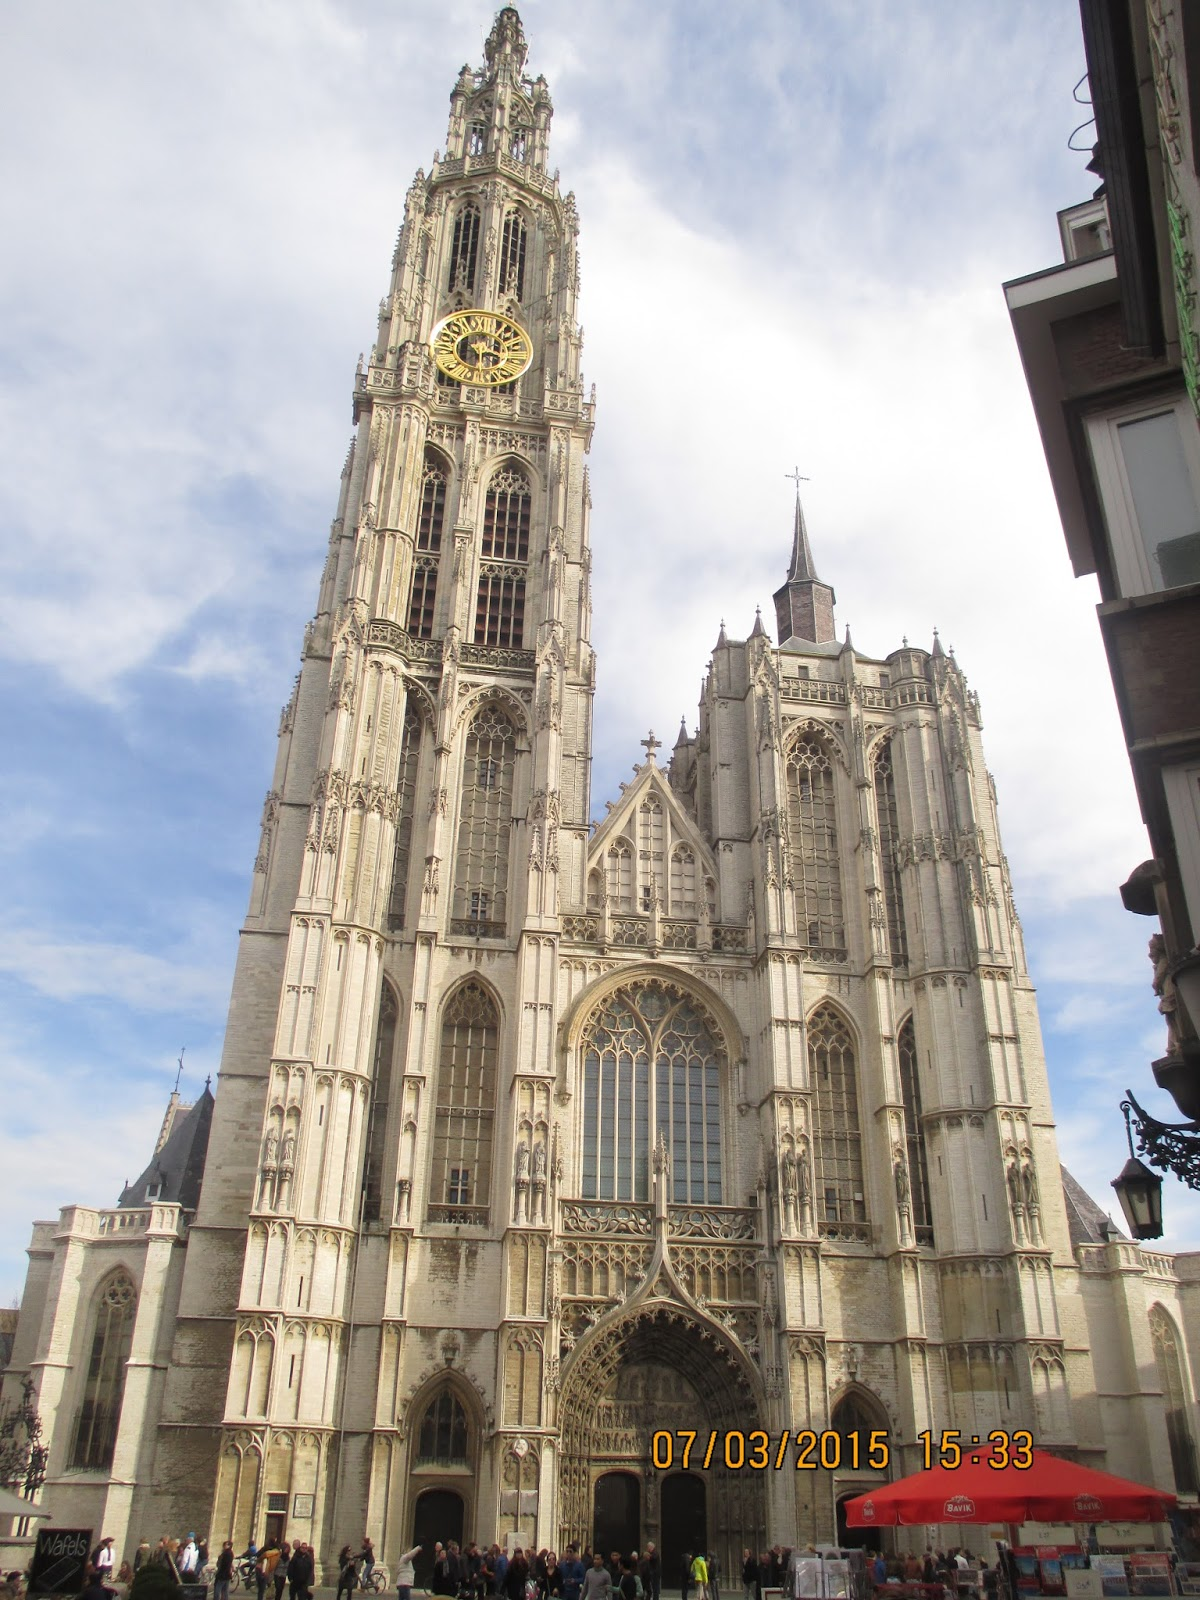 OLV-kathedraal in Antwerpen